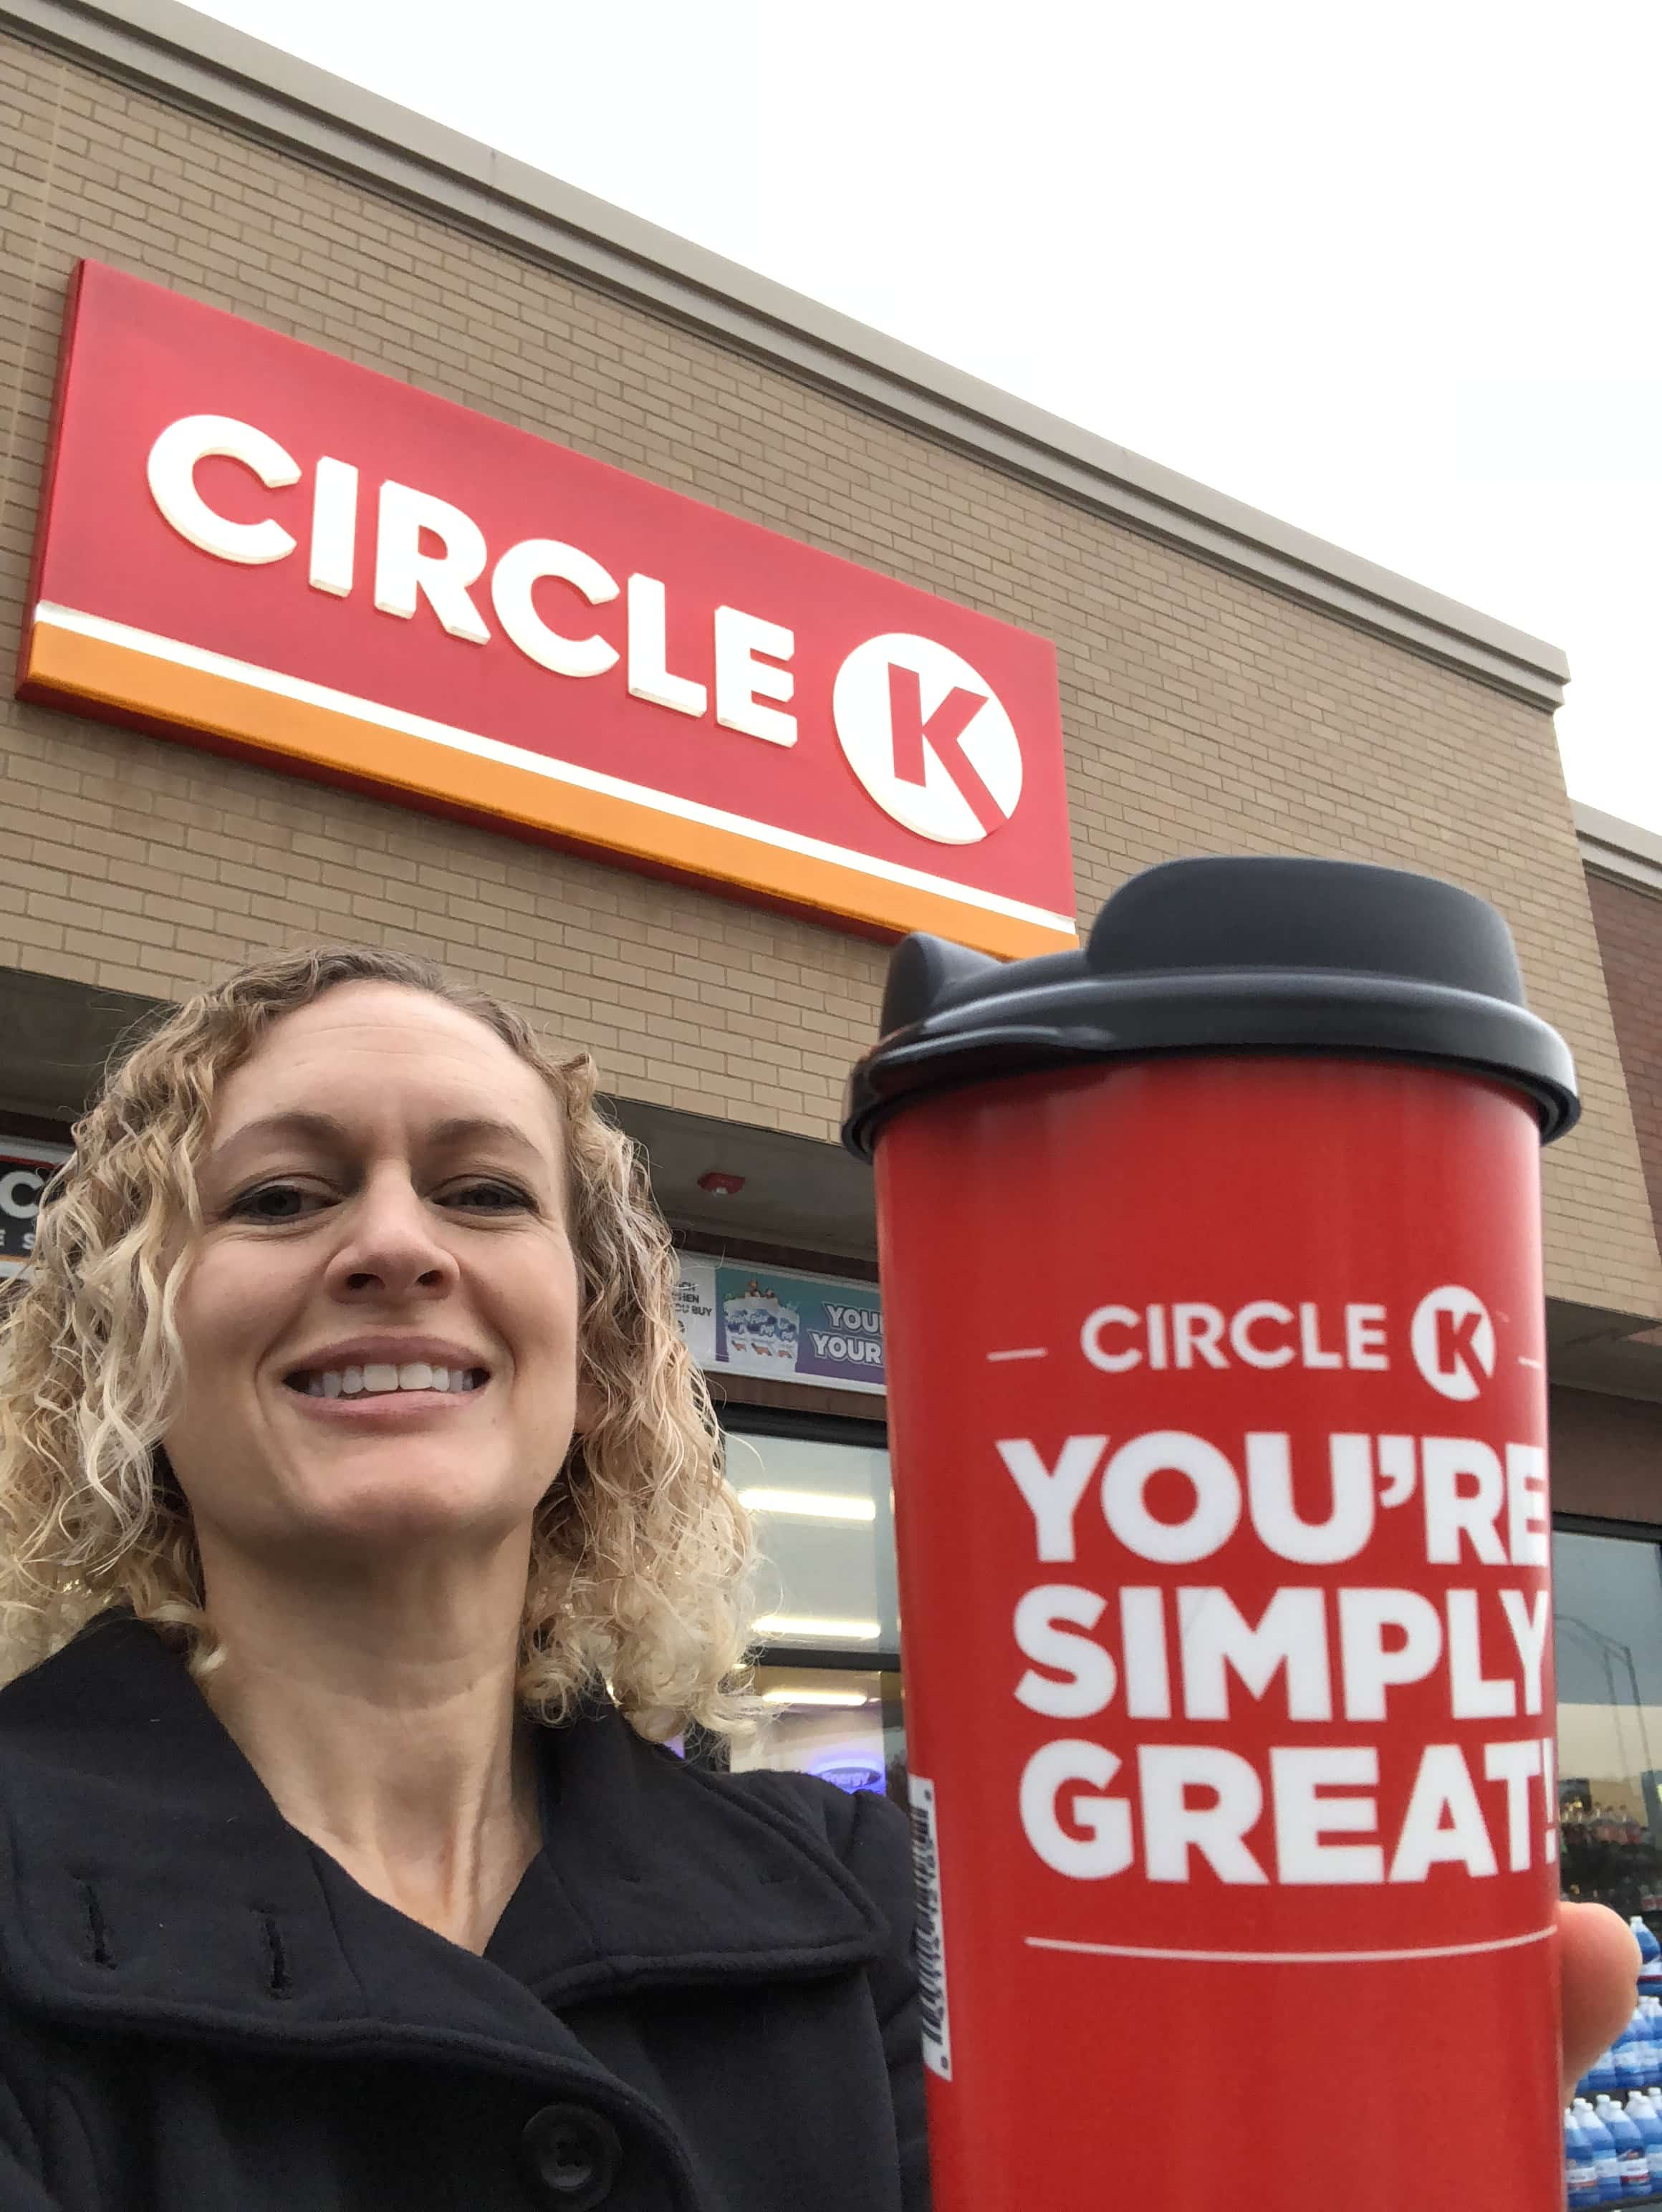 Simply great   Circle K